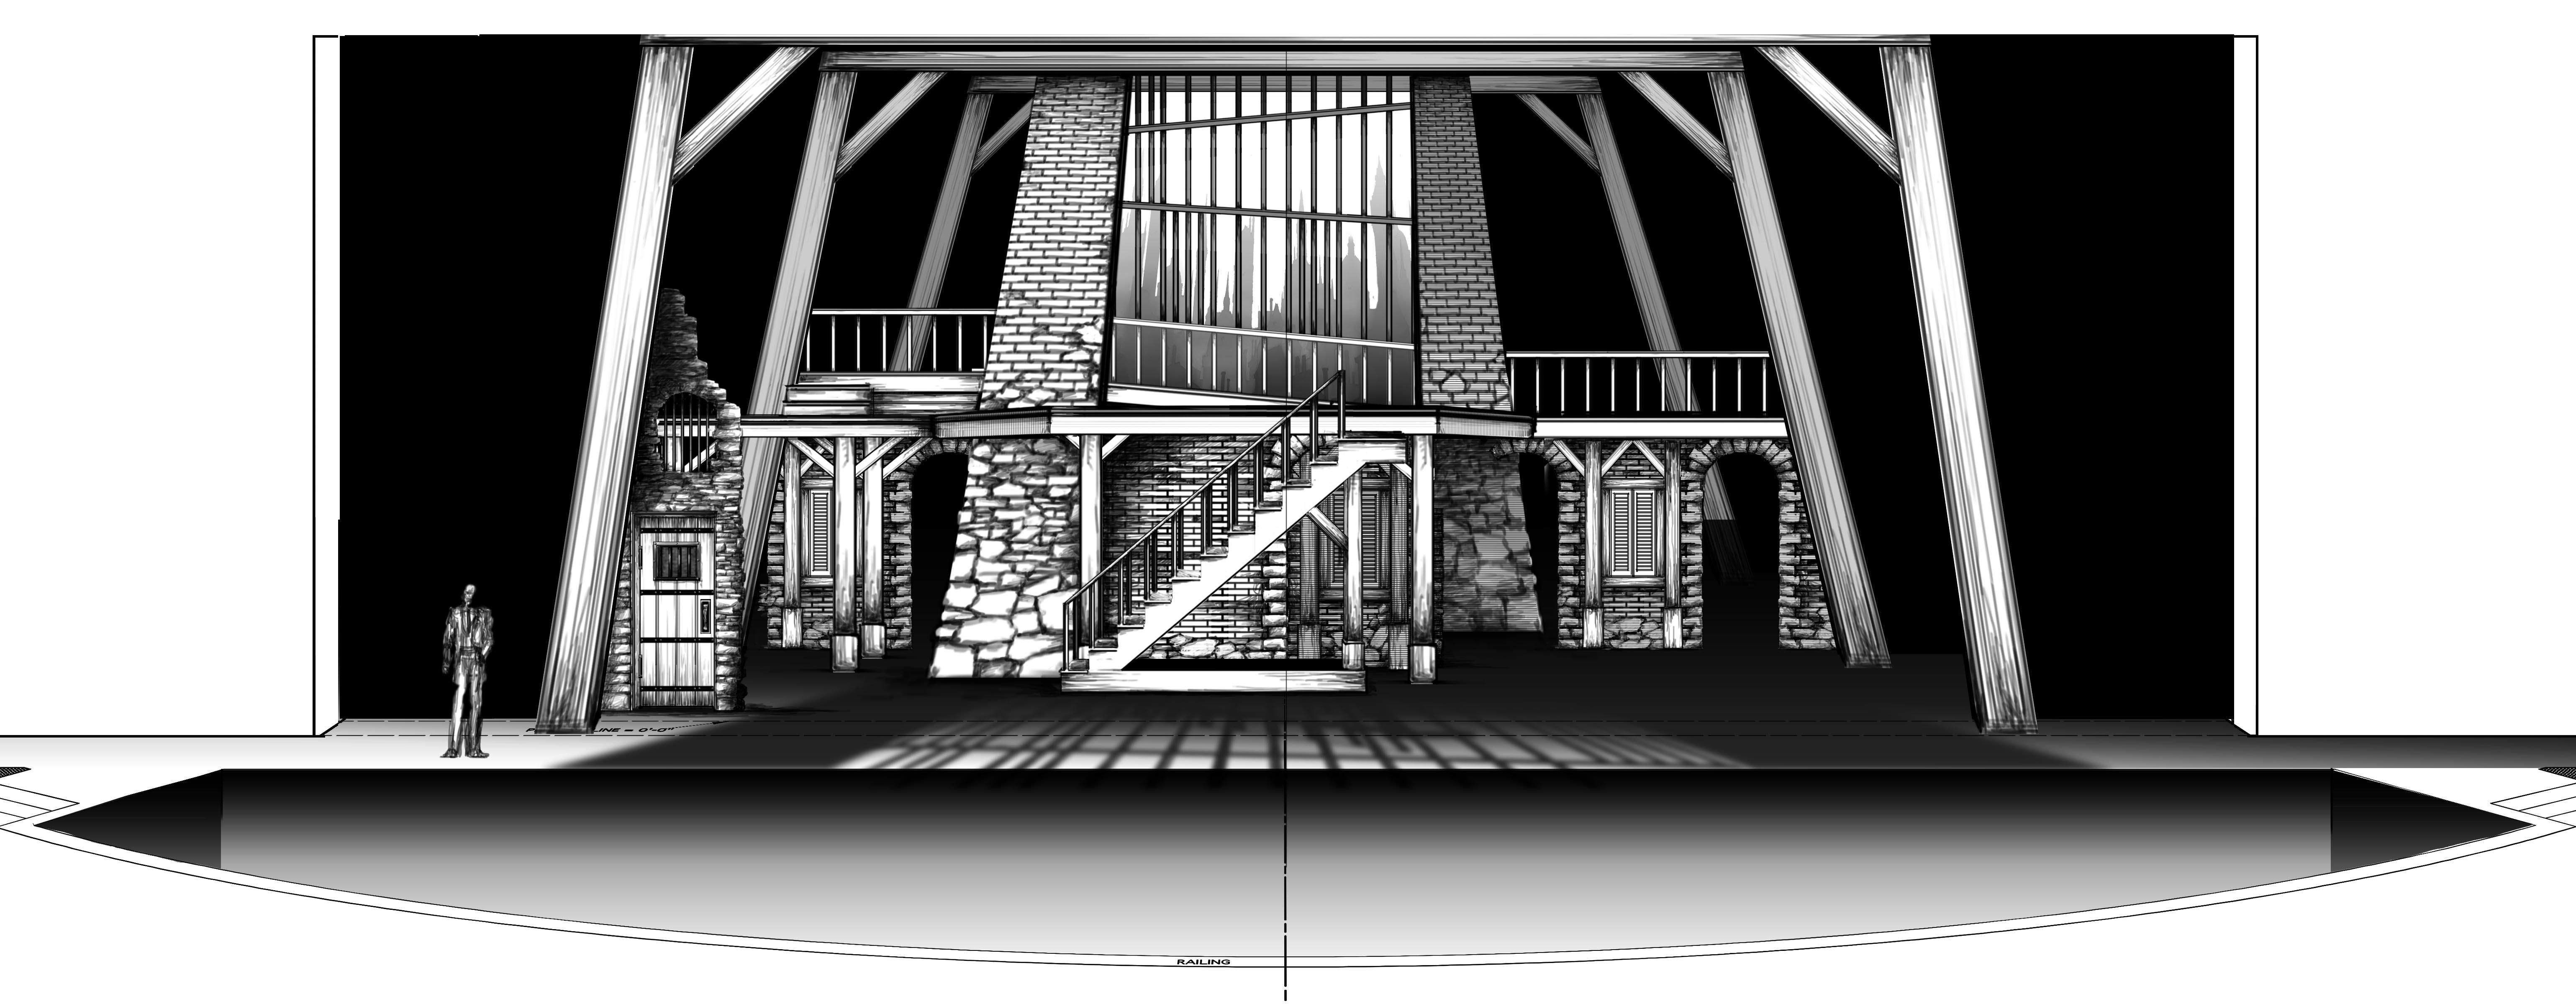 2.14- Fogg's Asylum